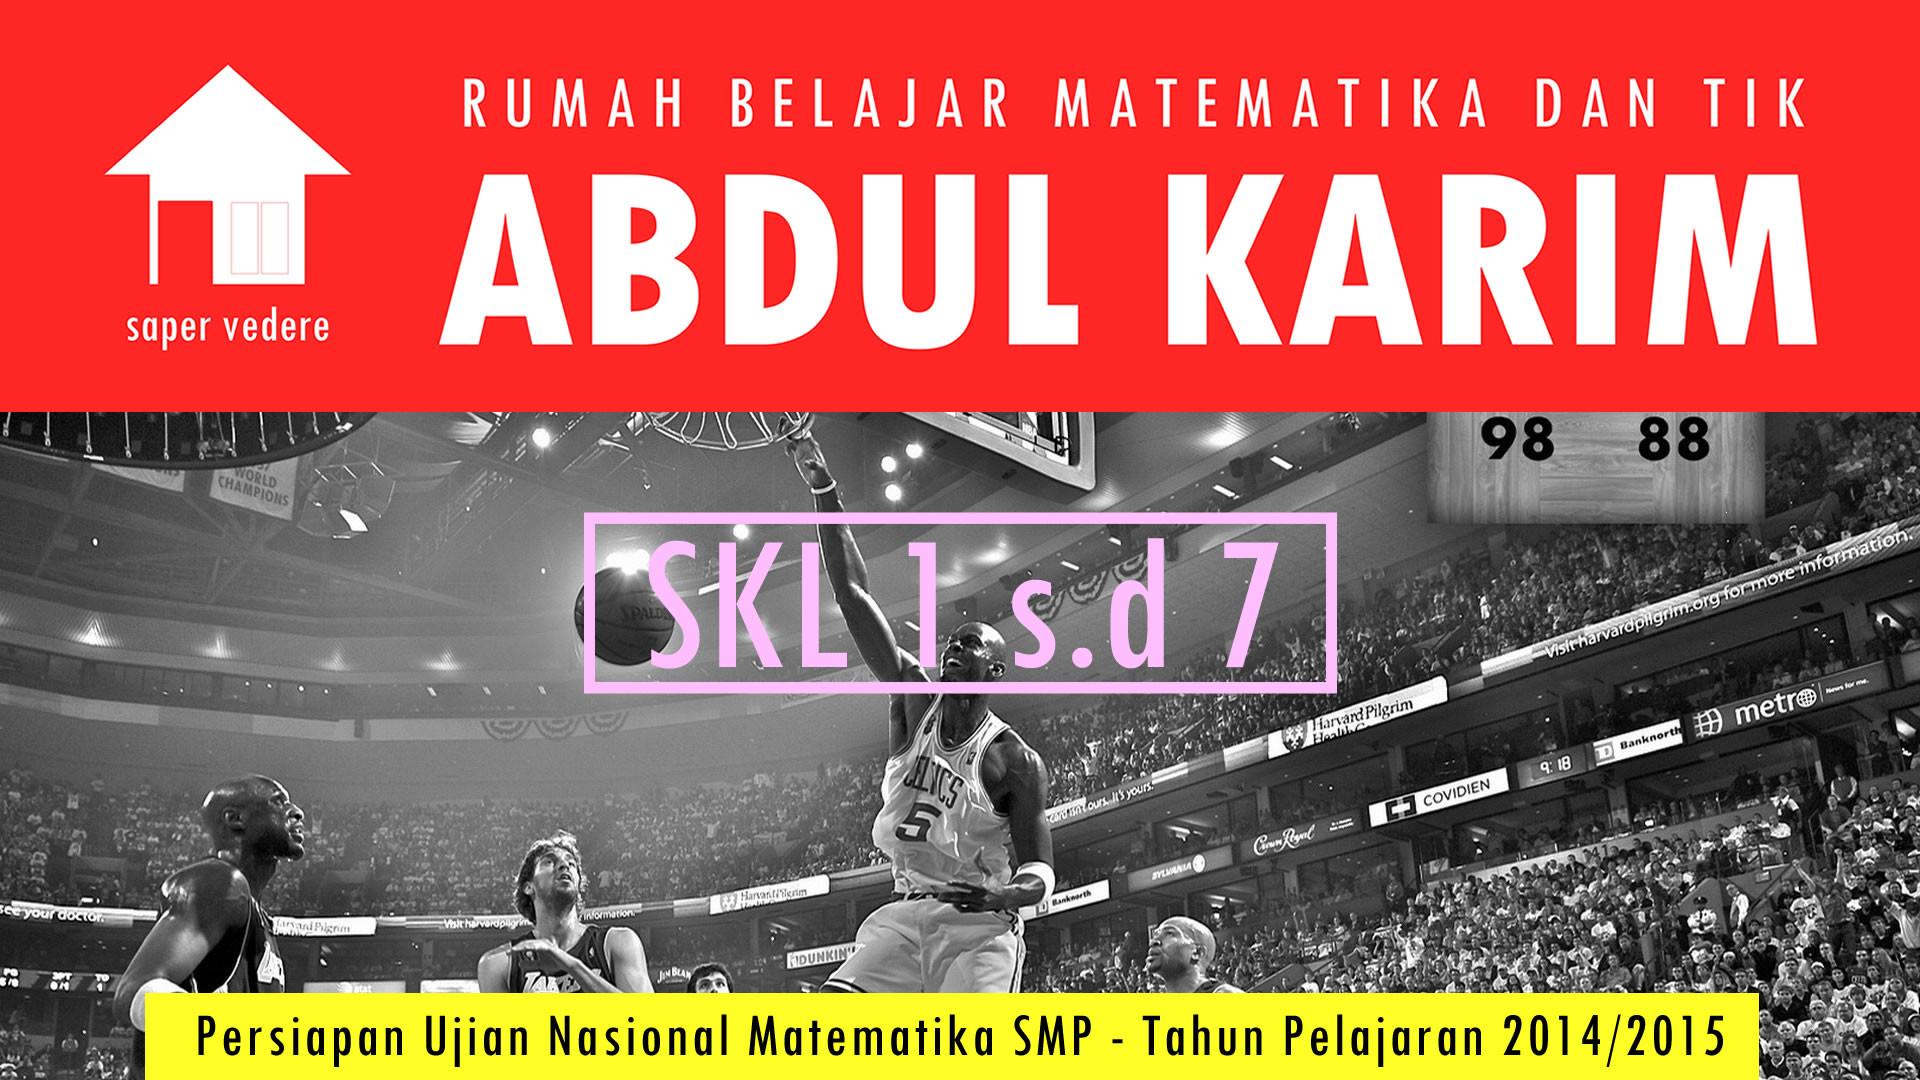 Wallpaper Ppt Terbaru 2018 ·â' WallpaperTag